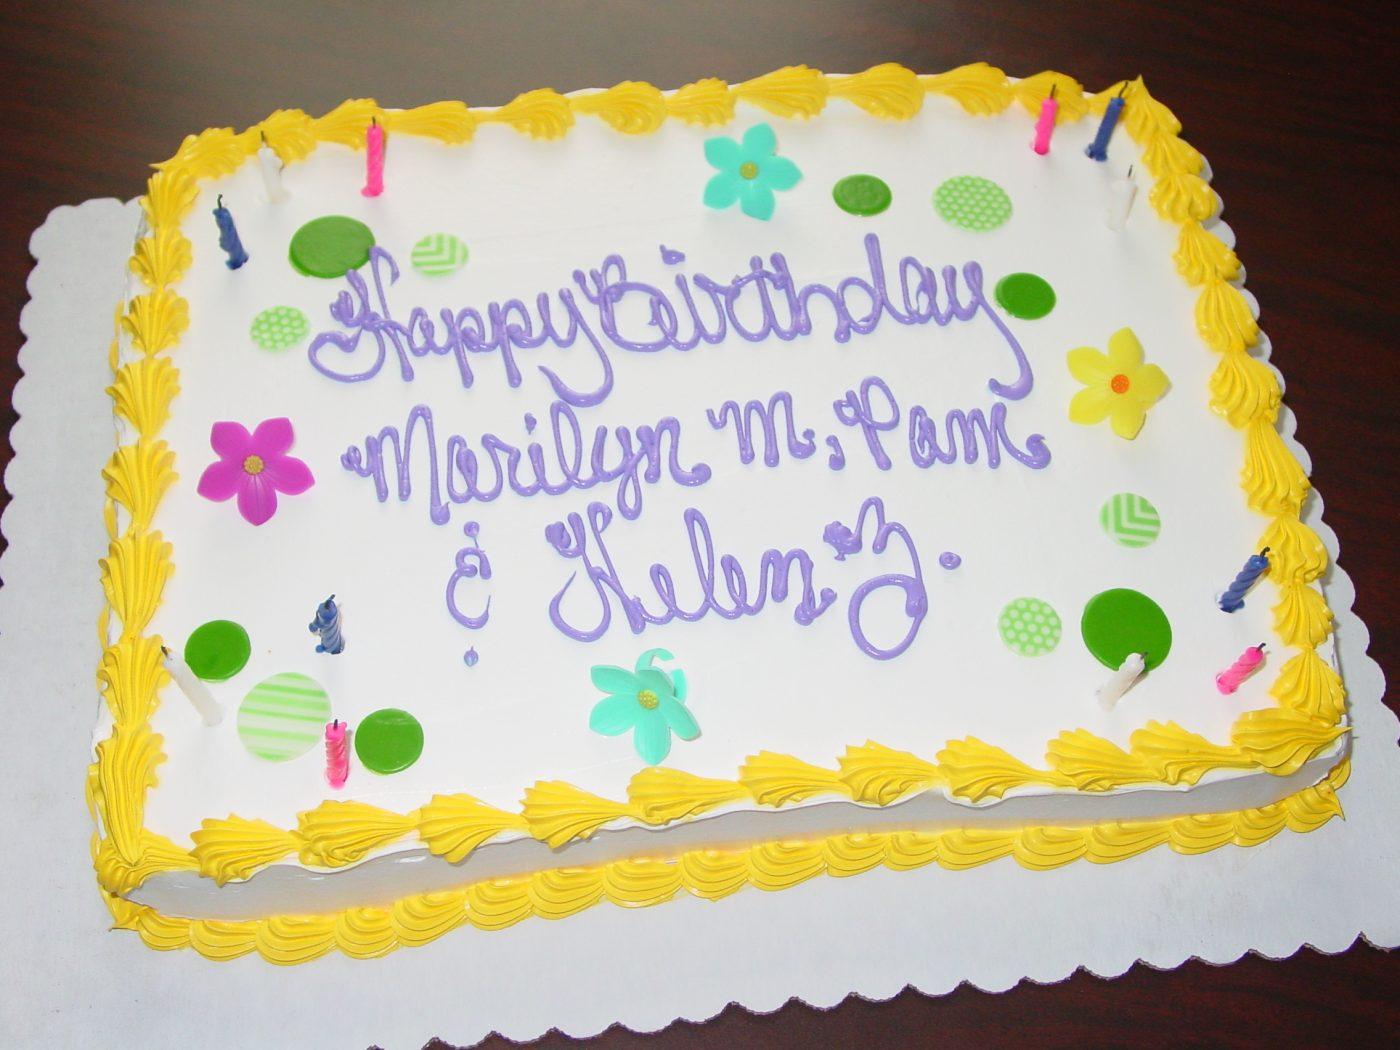 The Rockwood Celebrated March Birthdays St Louis Senior Living